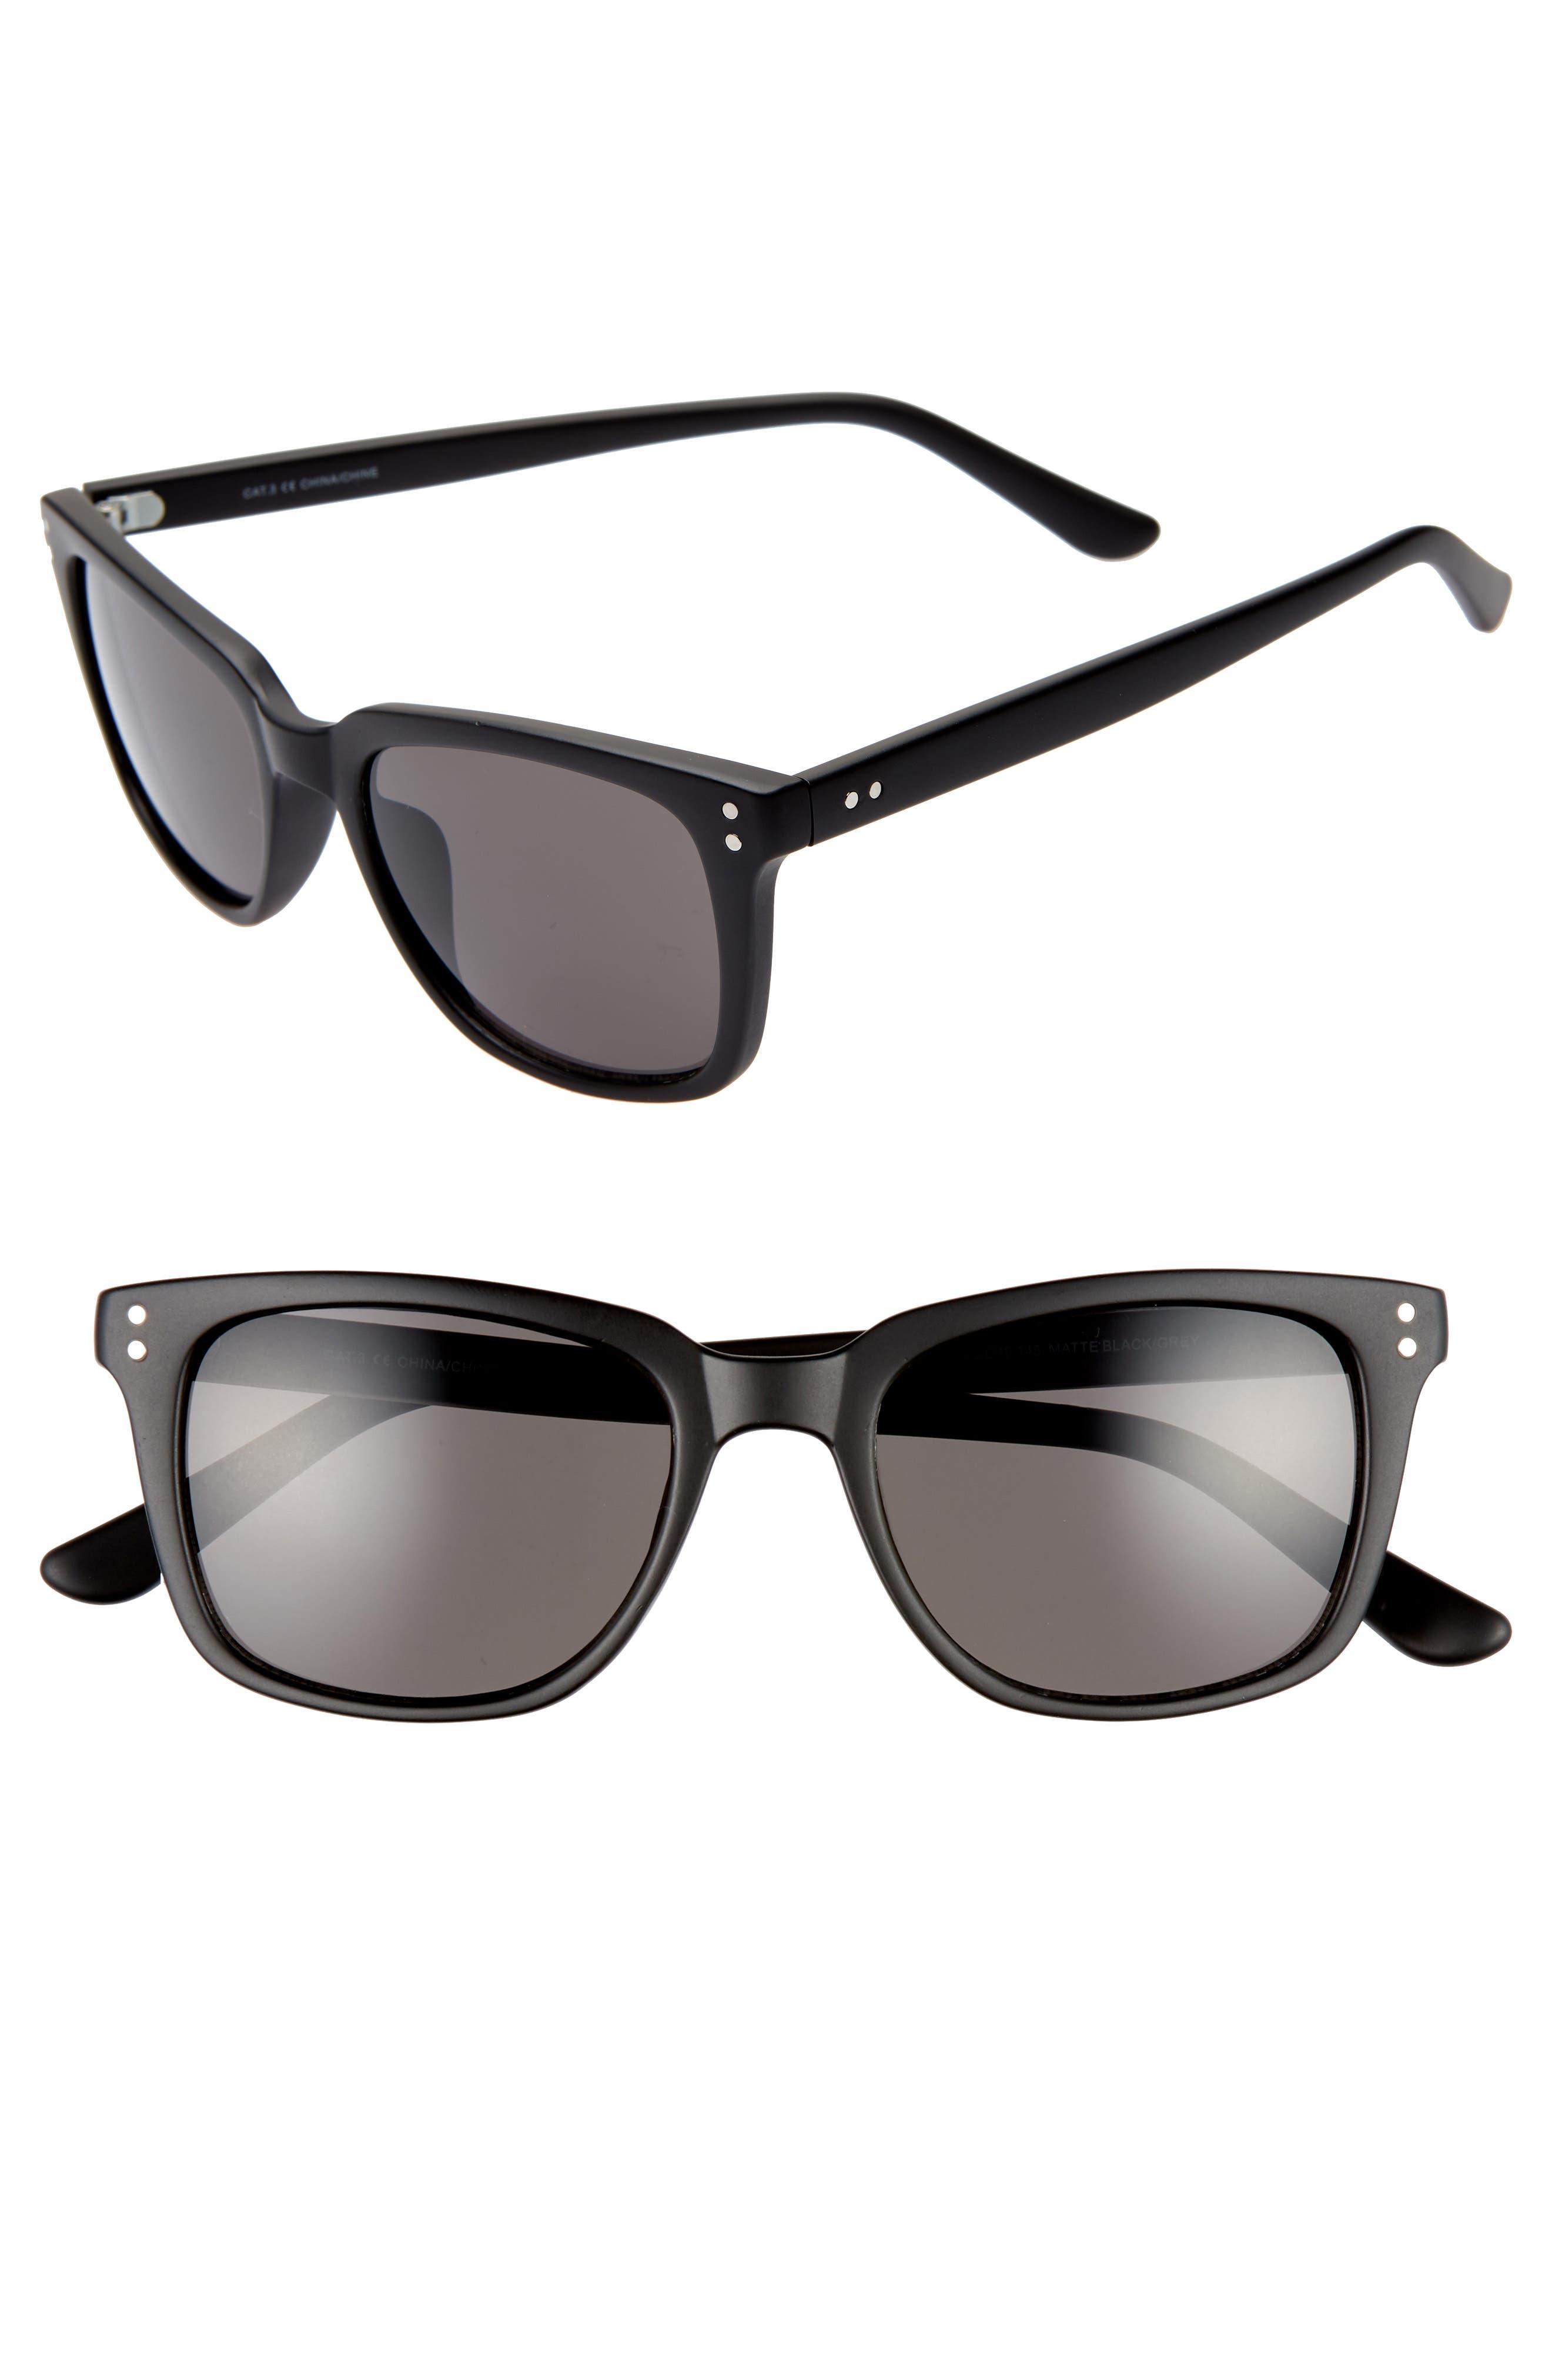 Curtis 52mm Square Sunglasses,                         Main,                         color, MATTE BLACK/ GREY